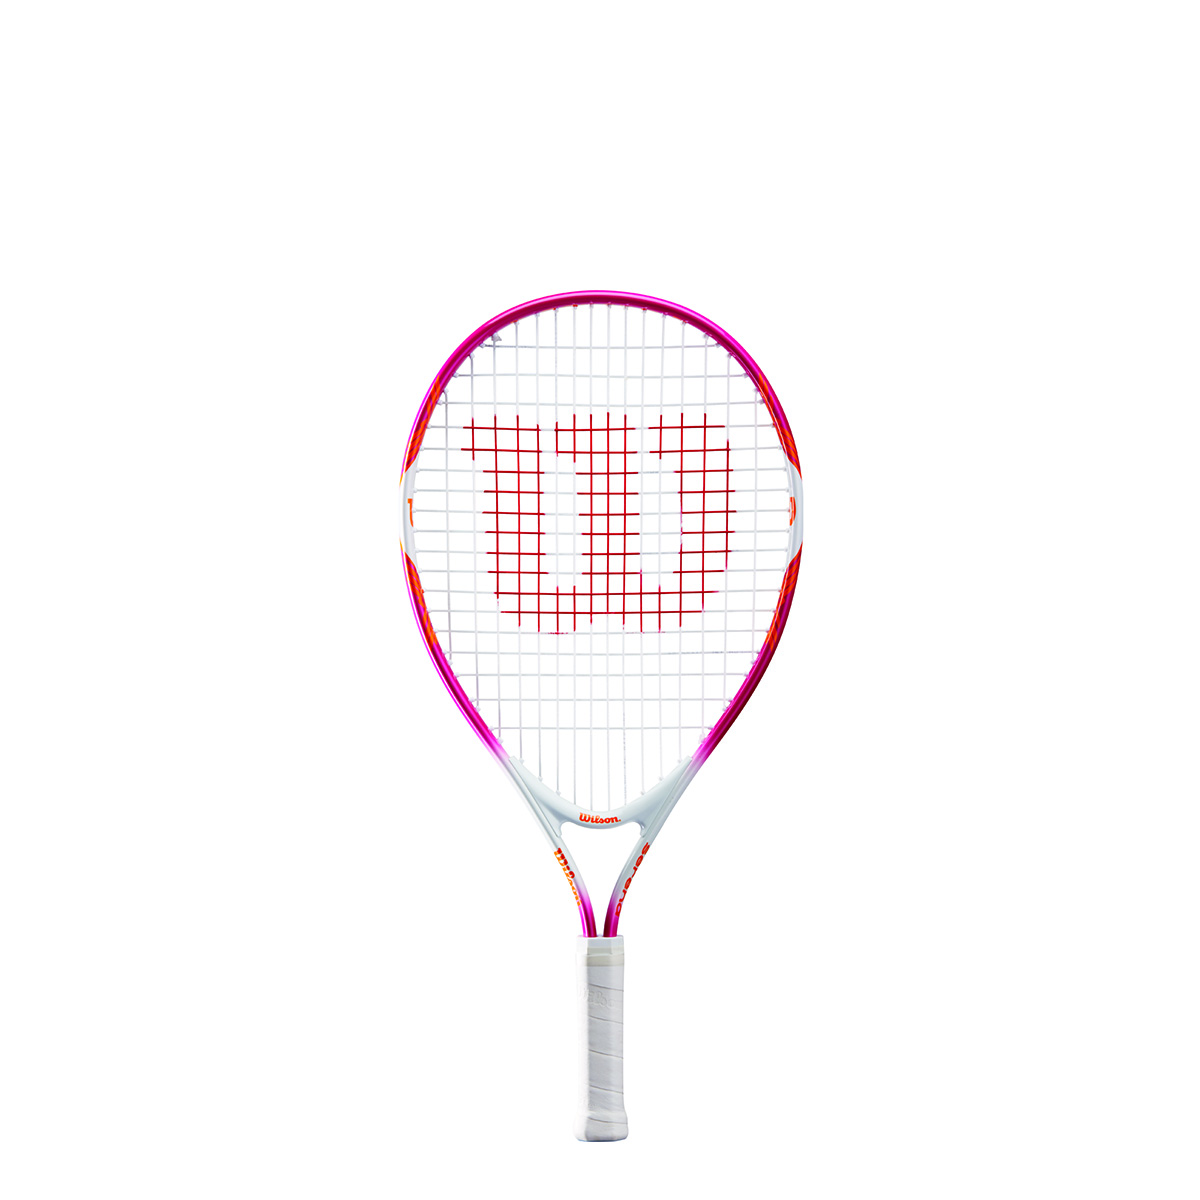 Ideal for the beginner junior player – Lightweight frame – Easy to swing